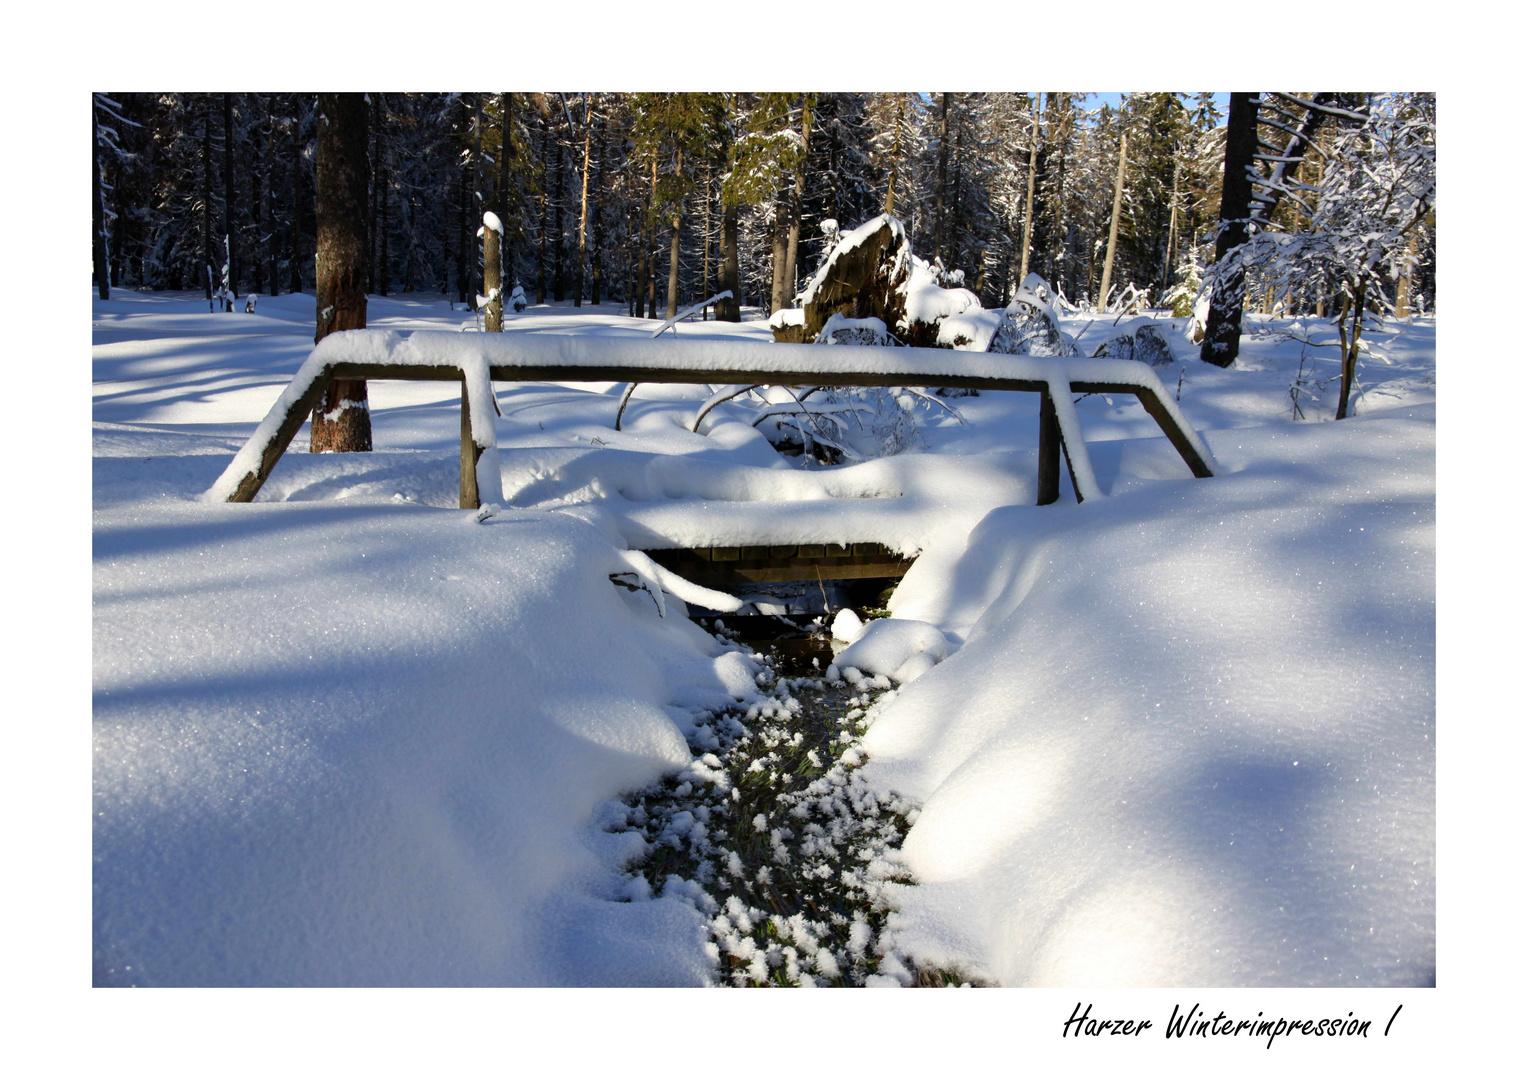 Harzer Winterimpression I